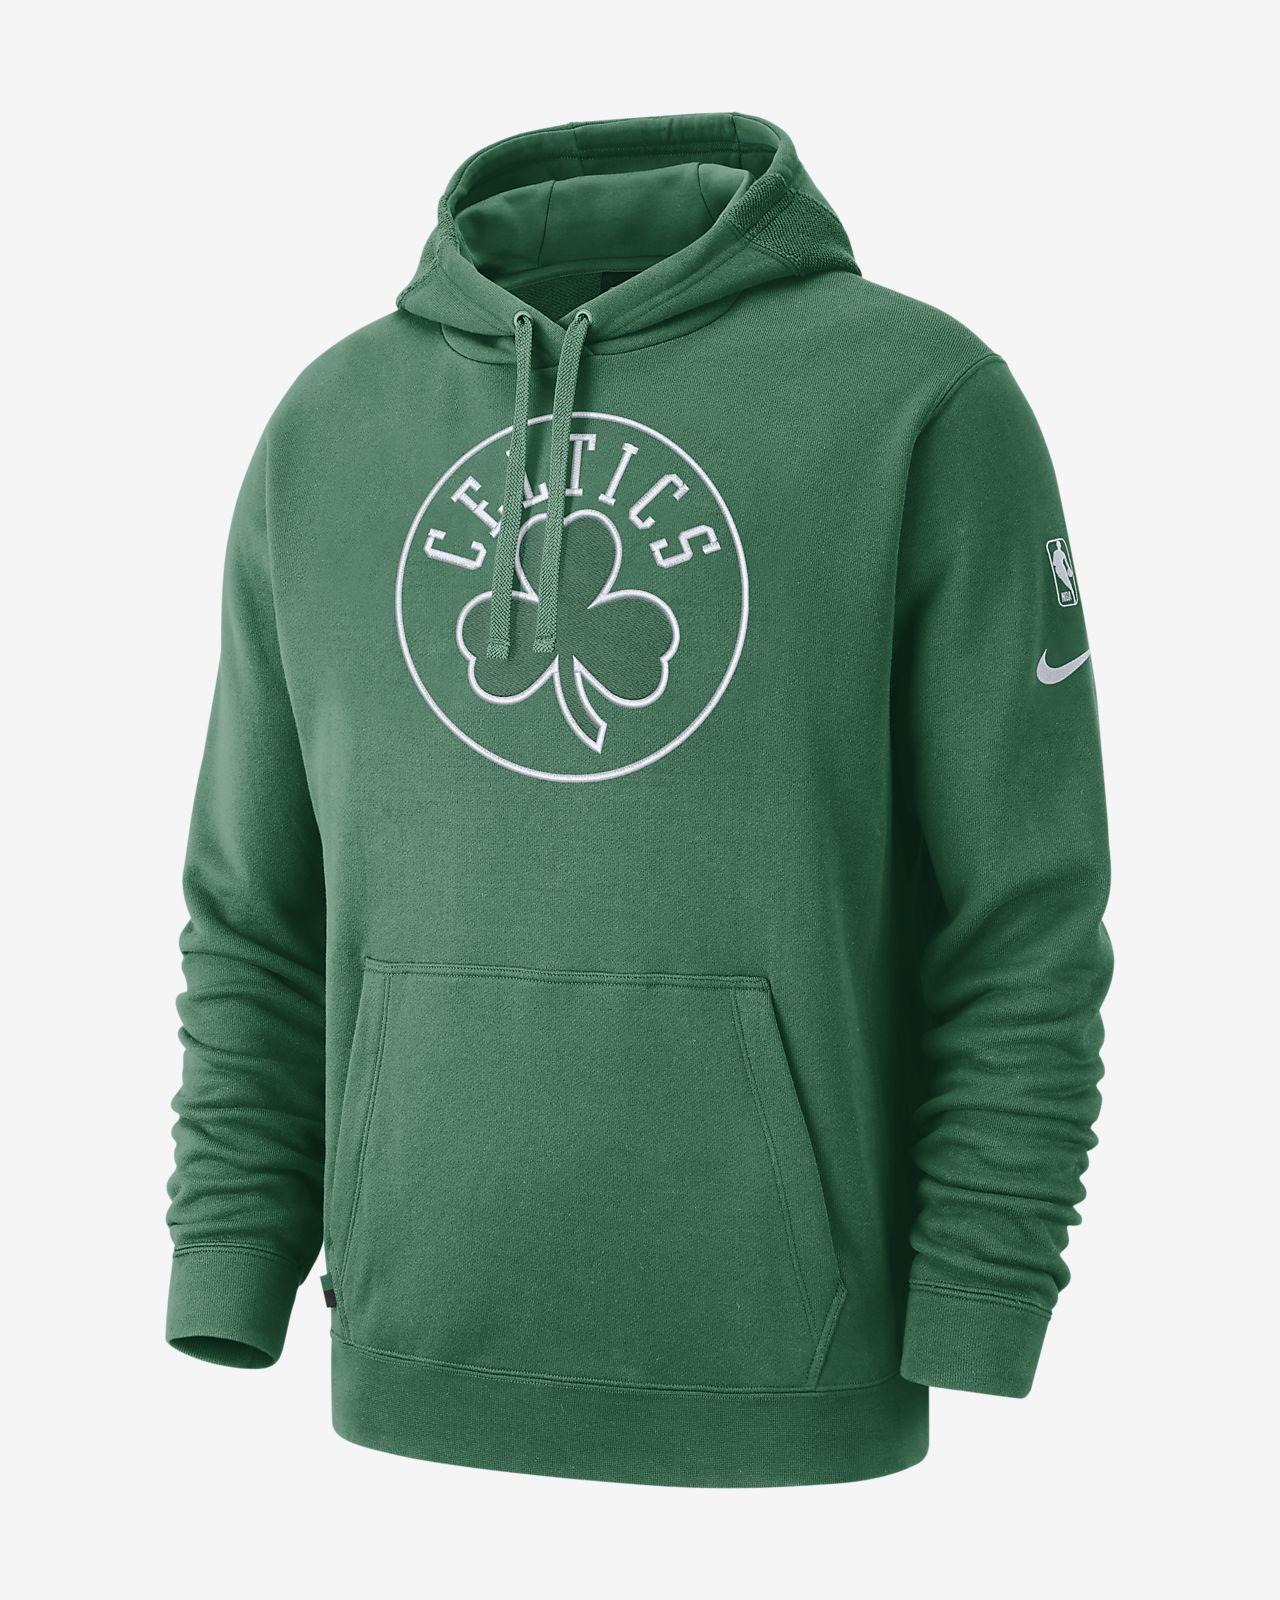 Boston Celtics Nike NBA-hoodie voor heren